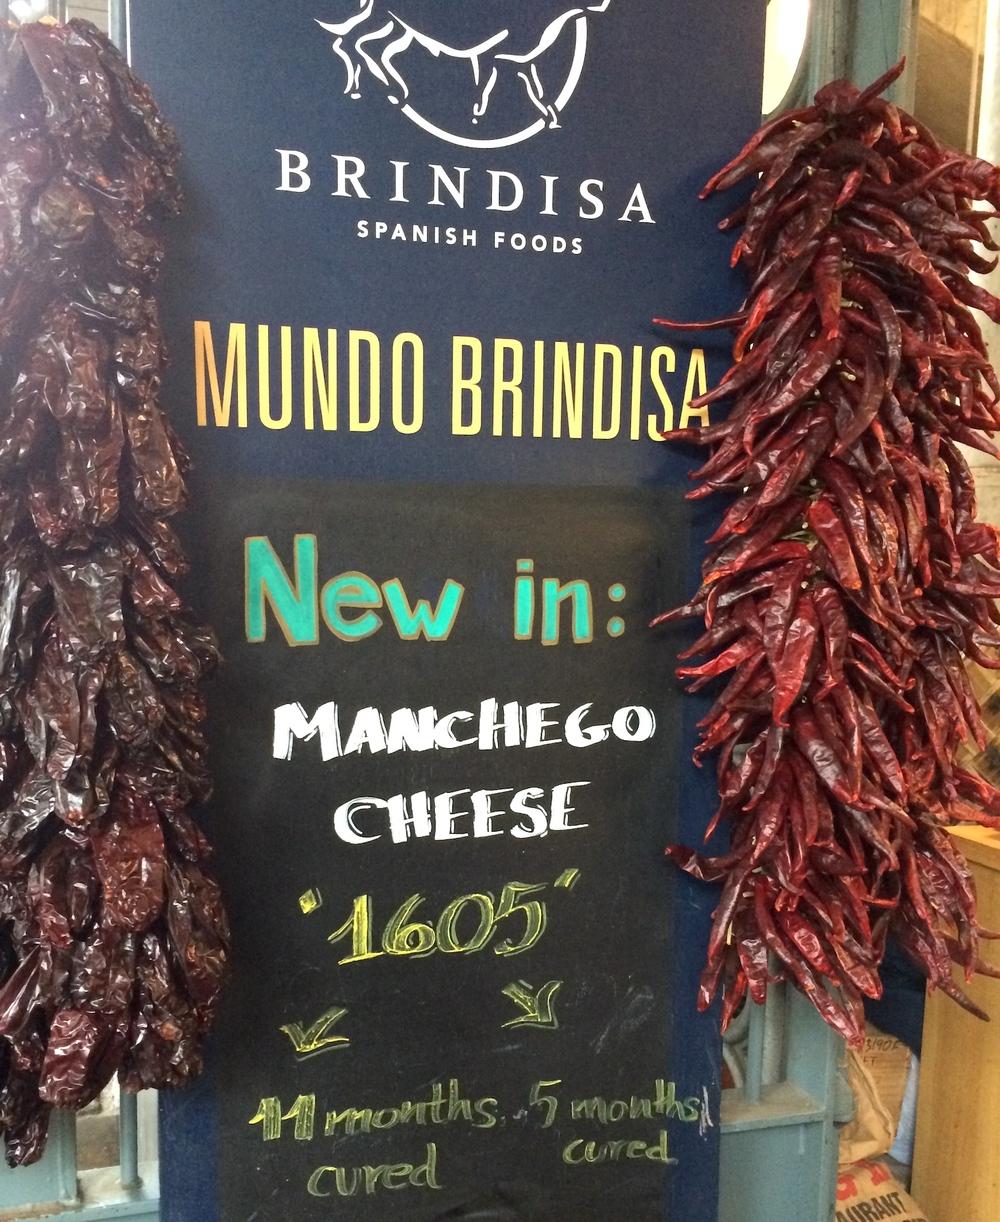 Brindisa